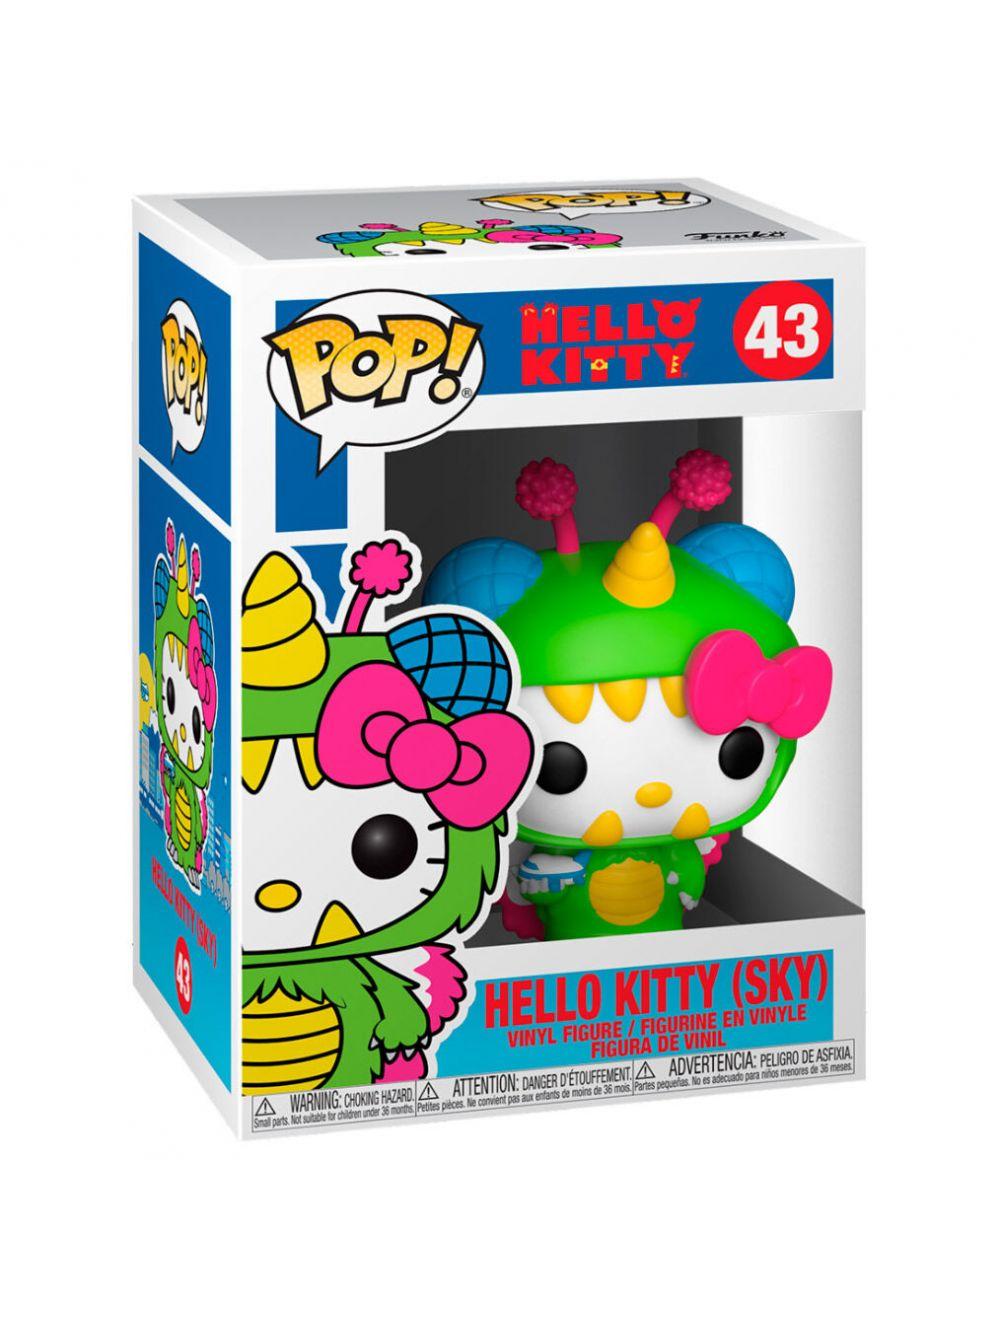 Funko POP! Sanrio Hello Kitty / Kaiju - Sky Kaiju Vinyl Figura 10cm